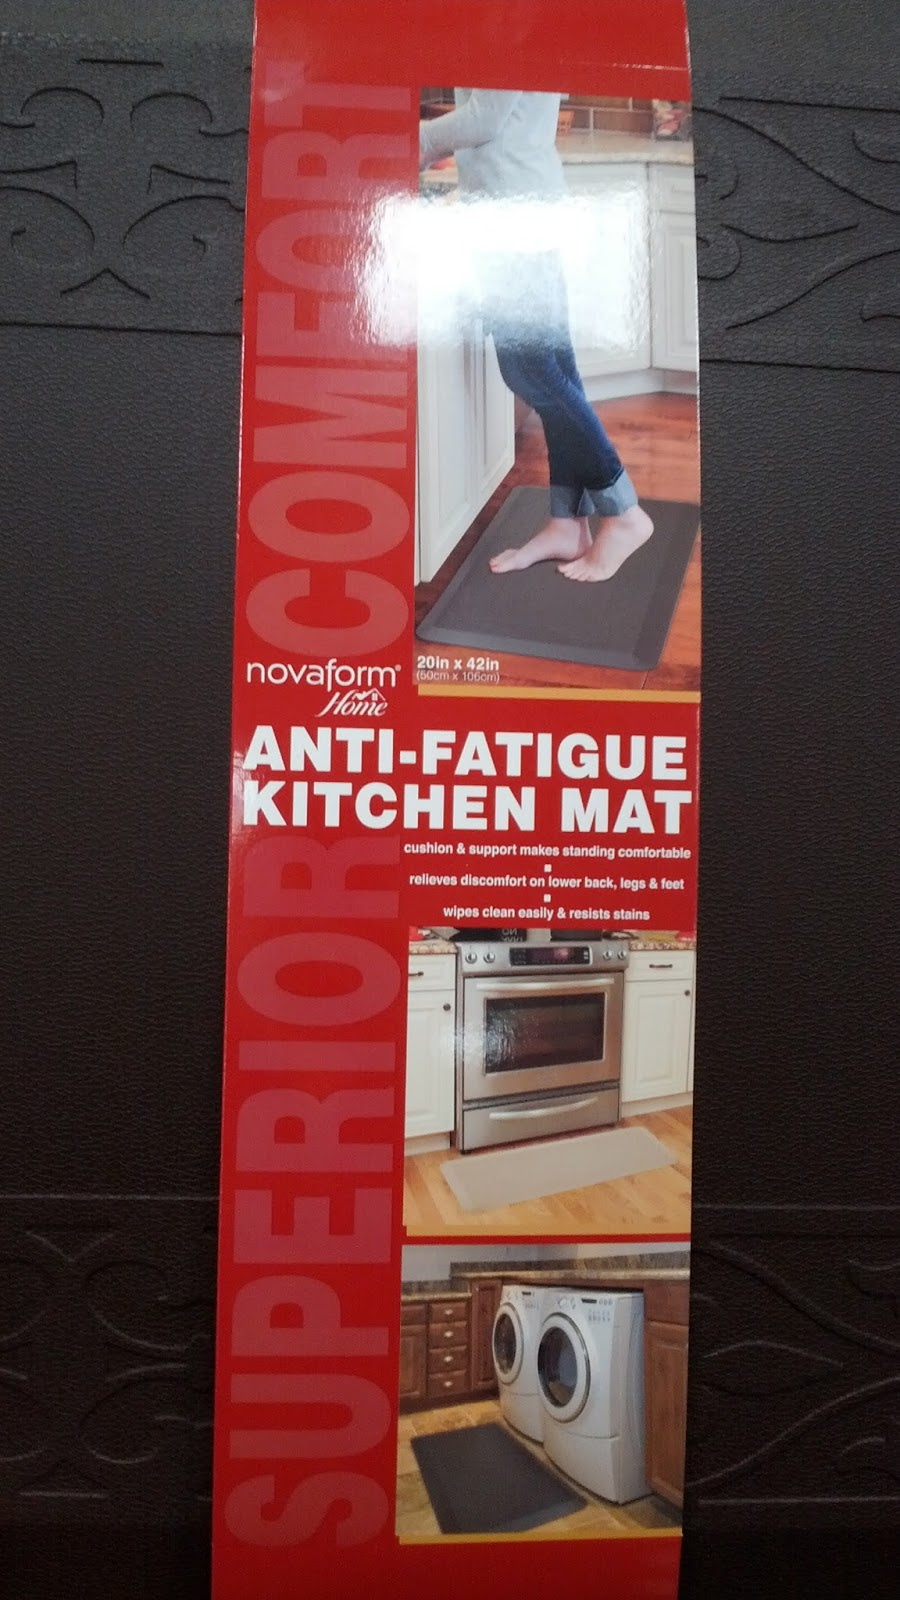 novaform kitchen mat denver hickory cabinets home anti fatigue foam costco weekender